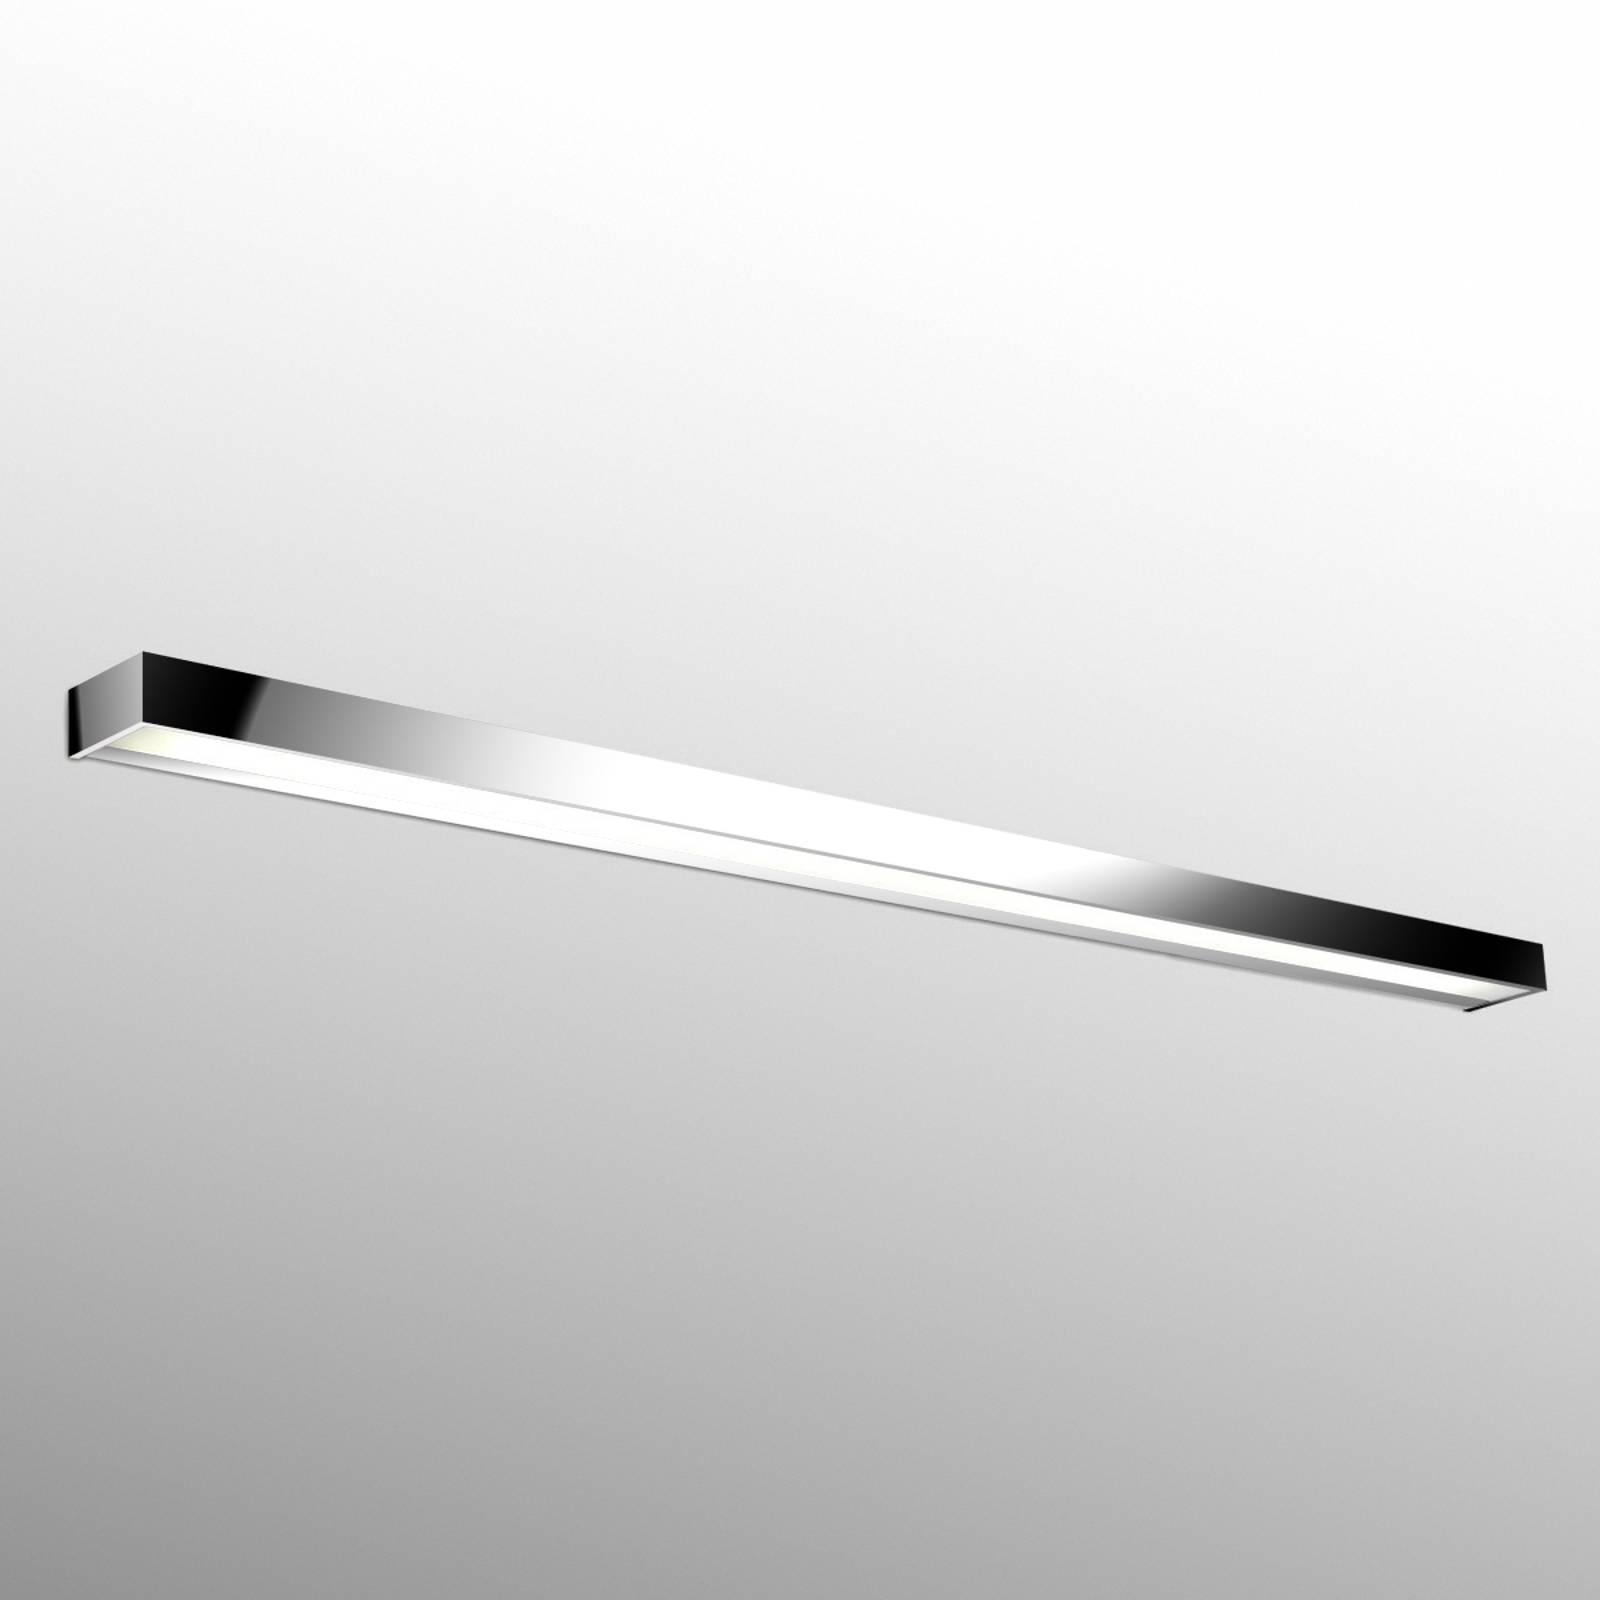 Verraton LED-seinävalaisin Apolo, 150 cm, kromi